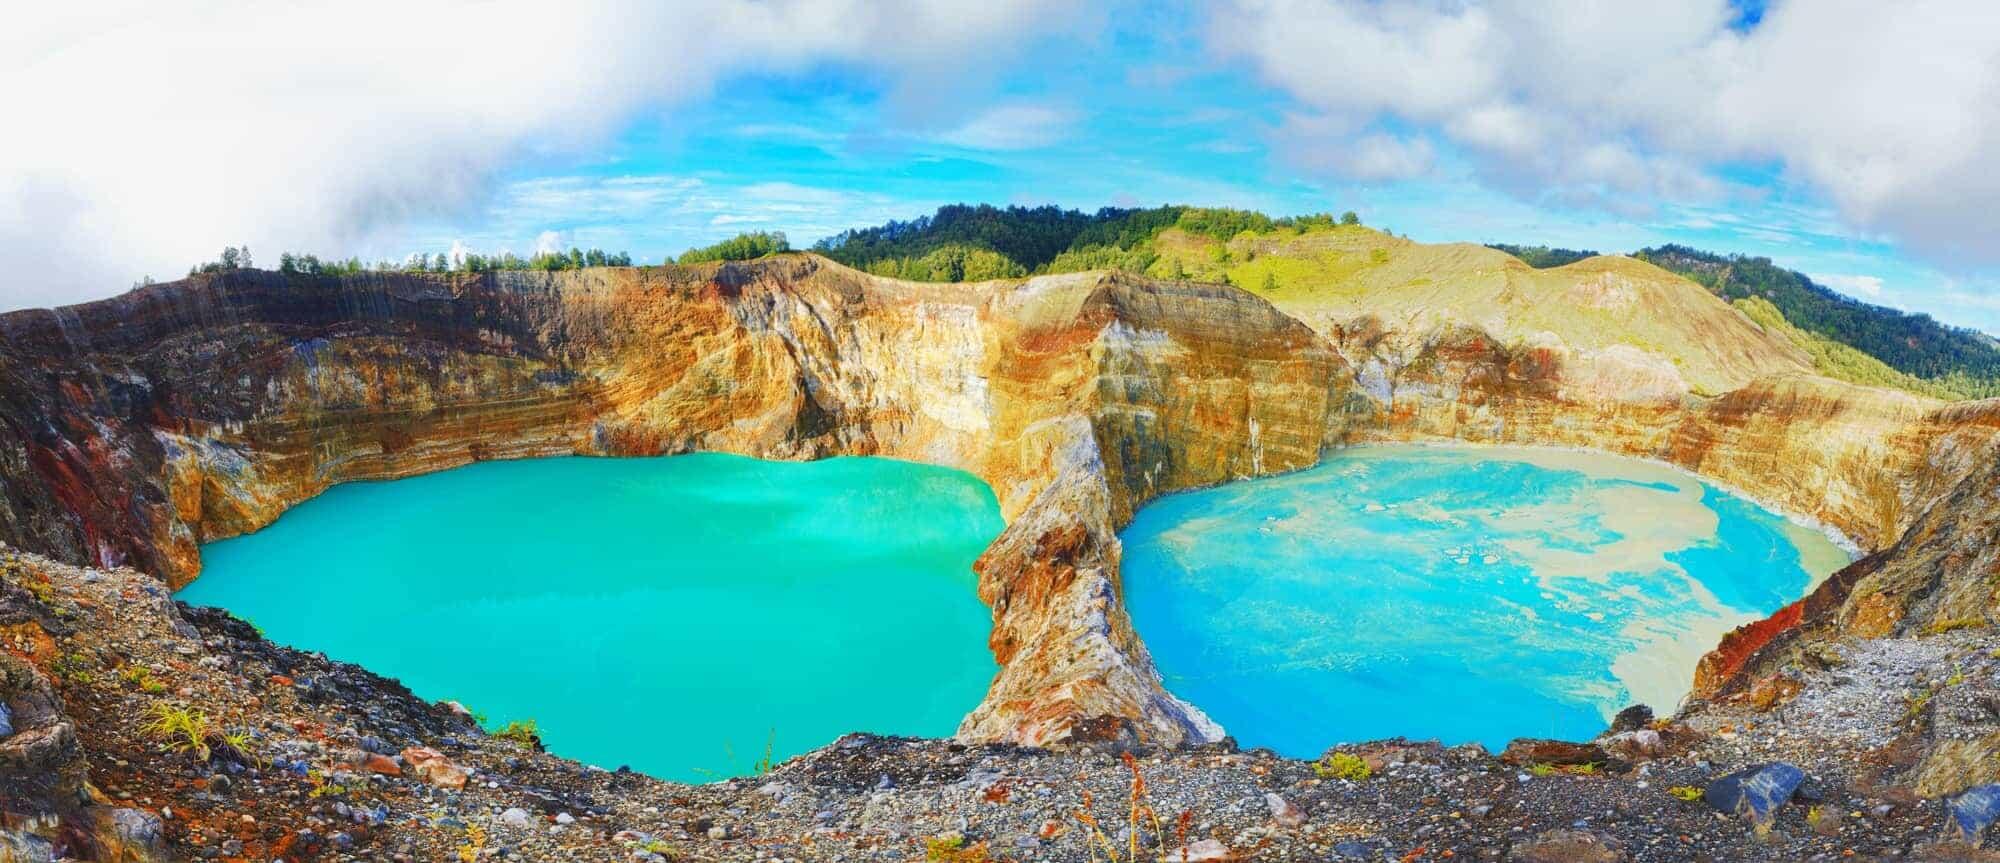 Volcanic lakes Ato Polo and Nuamuri koofai . National park Kelimutu.